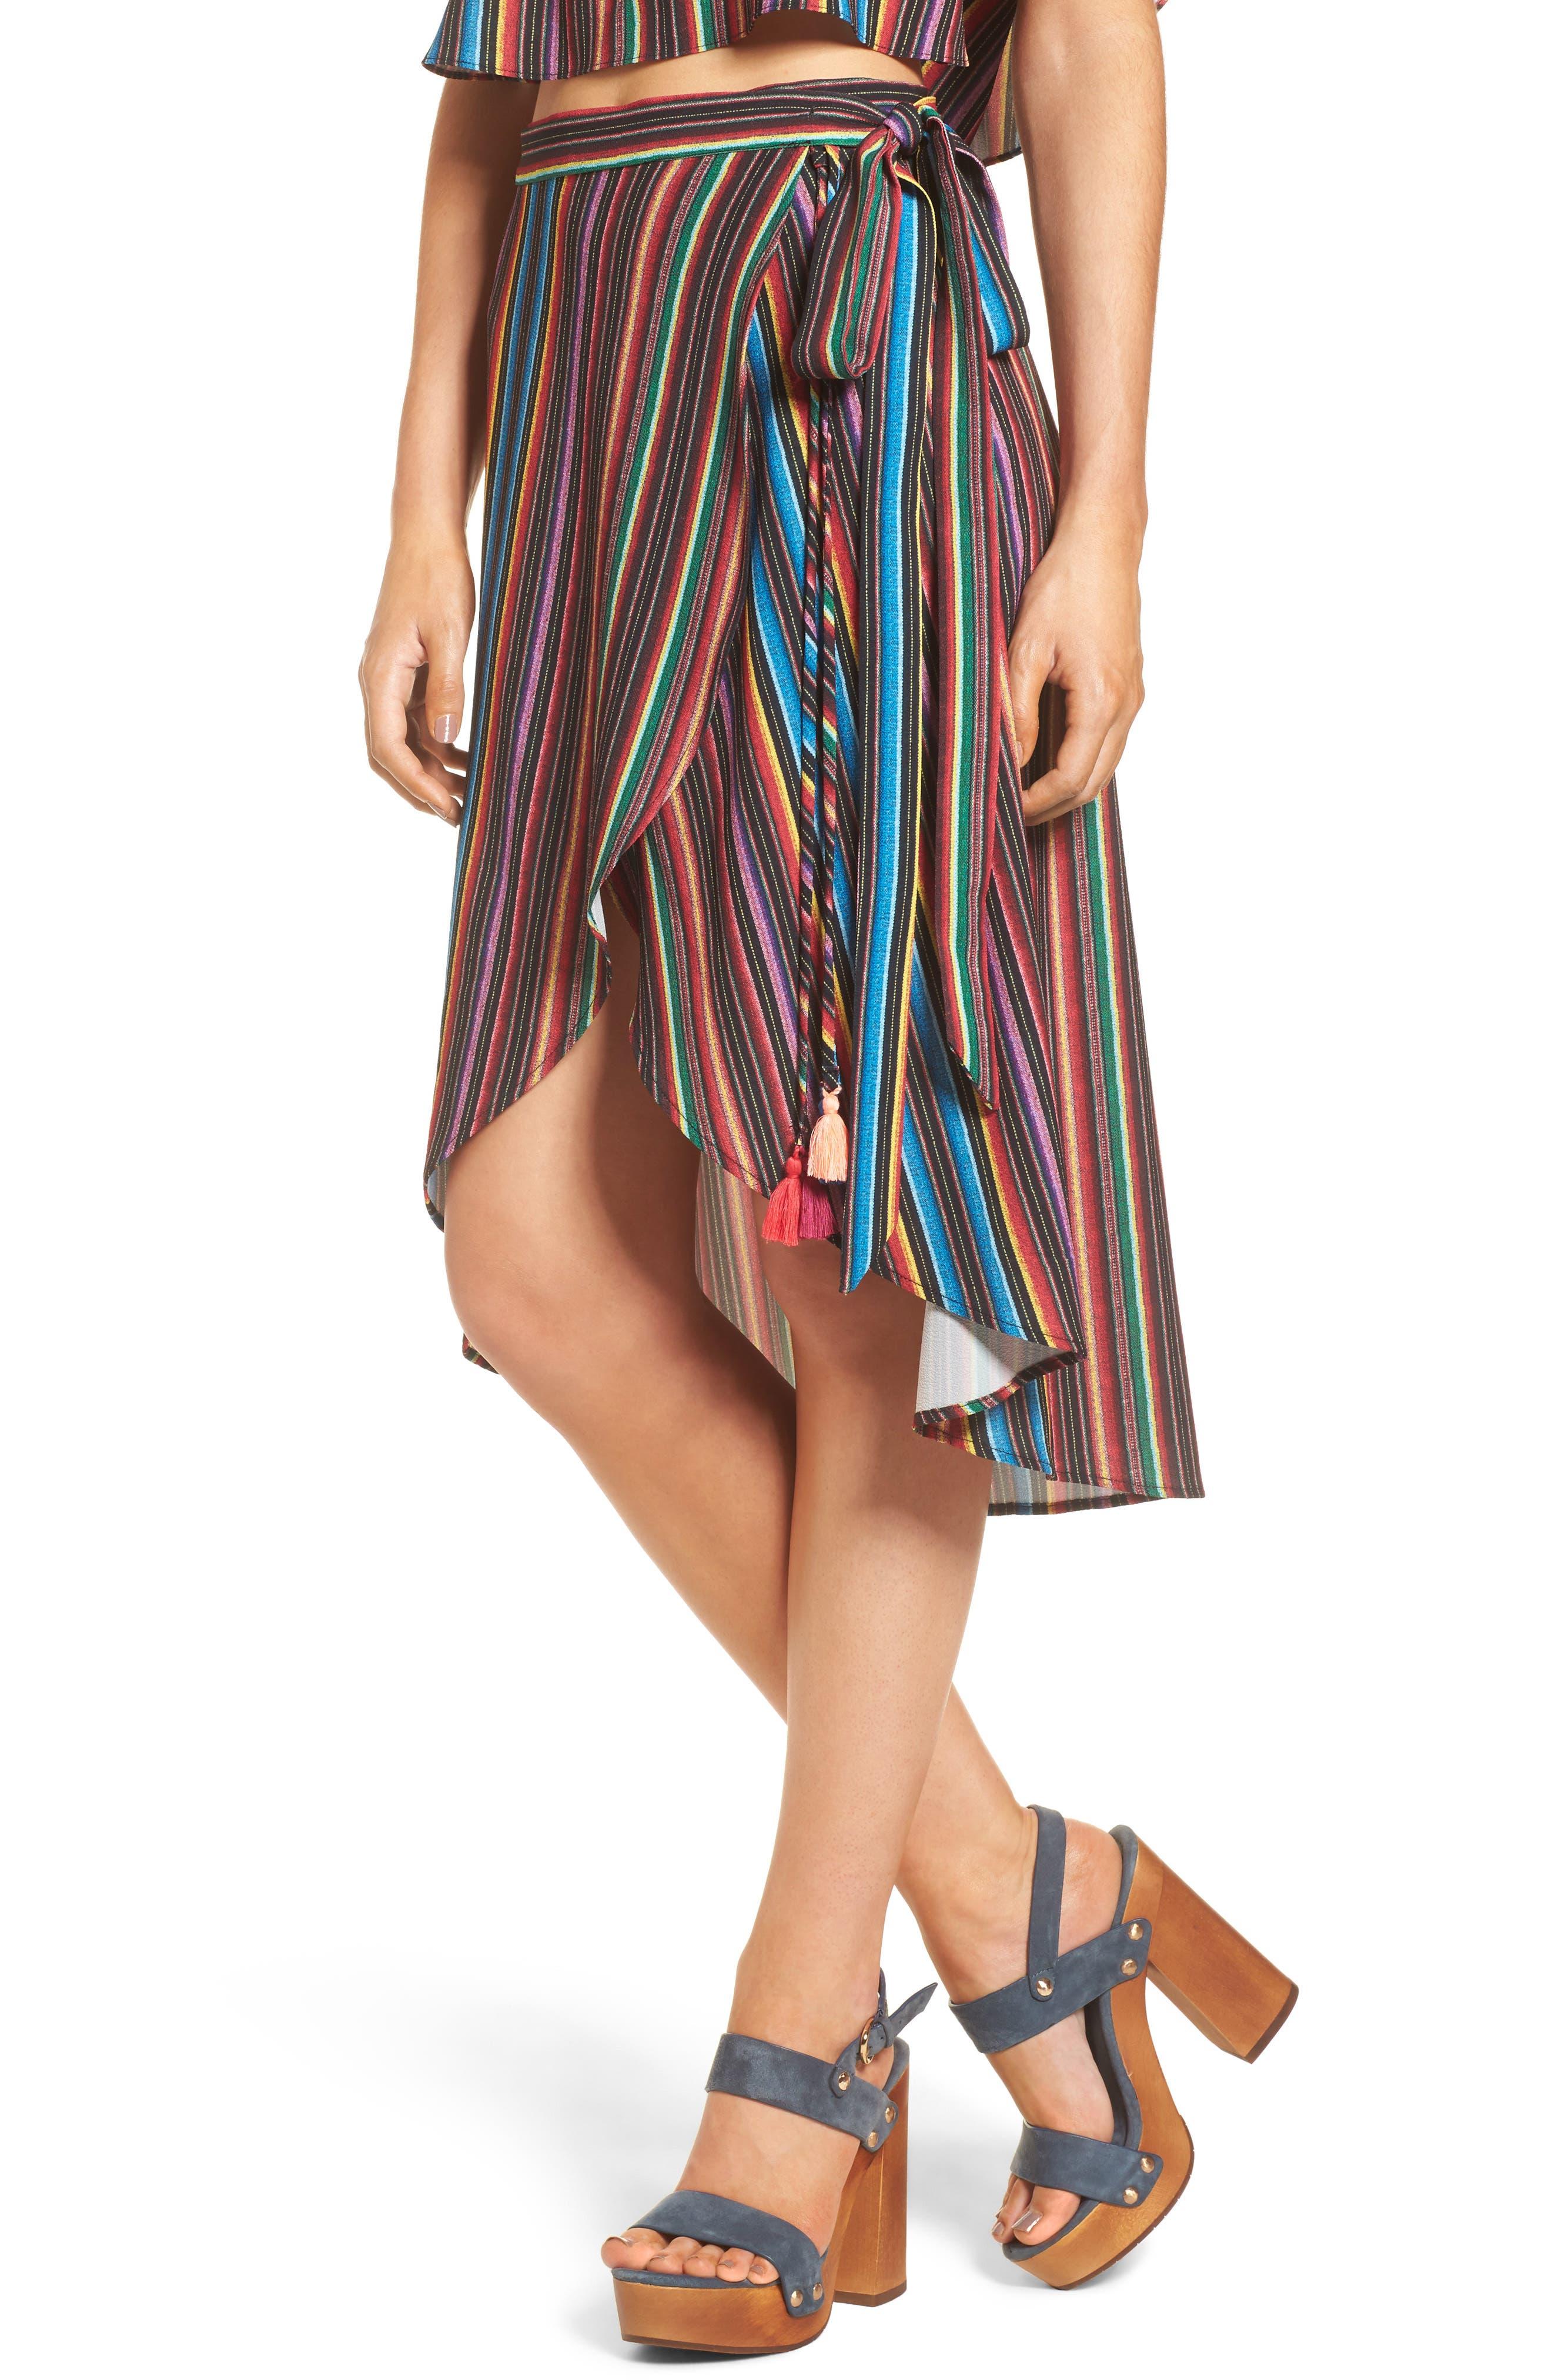 Alternate Image 1 Selected - Show Me Your Mumu Panama Tassel Wrap Skirt